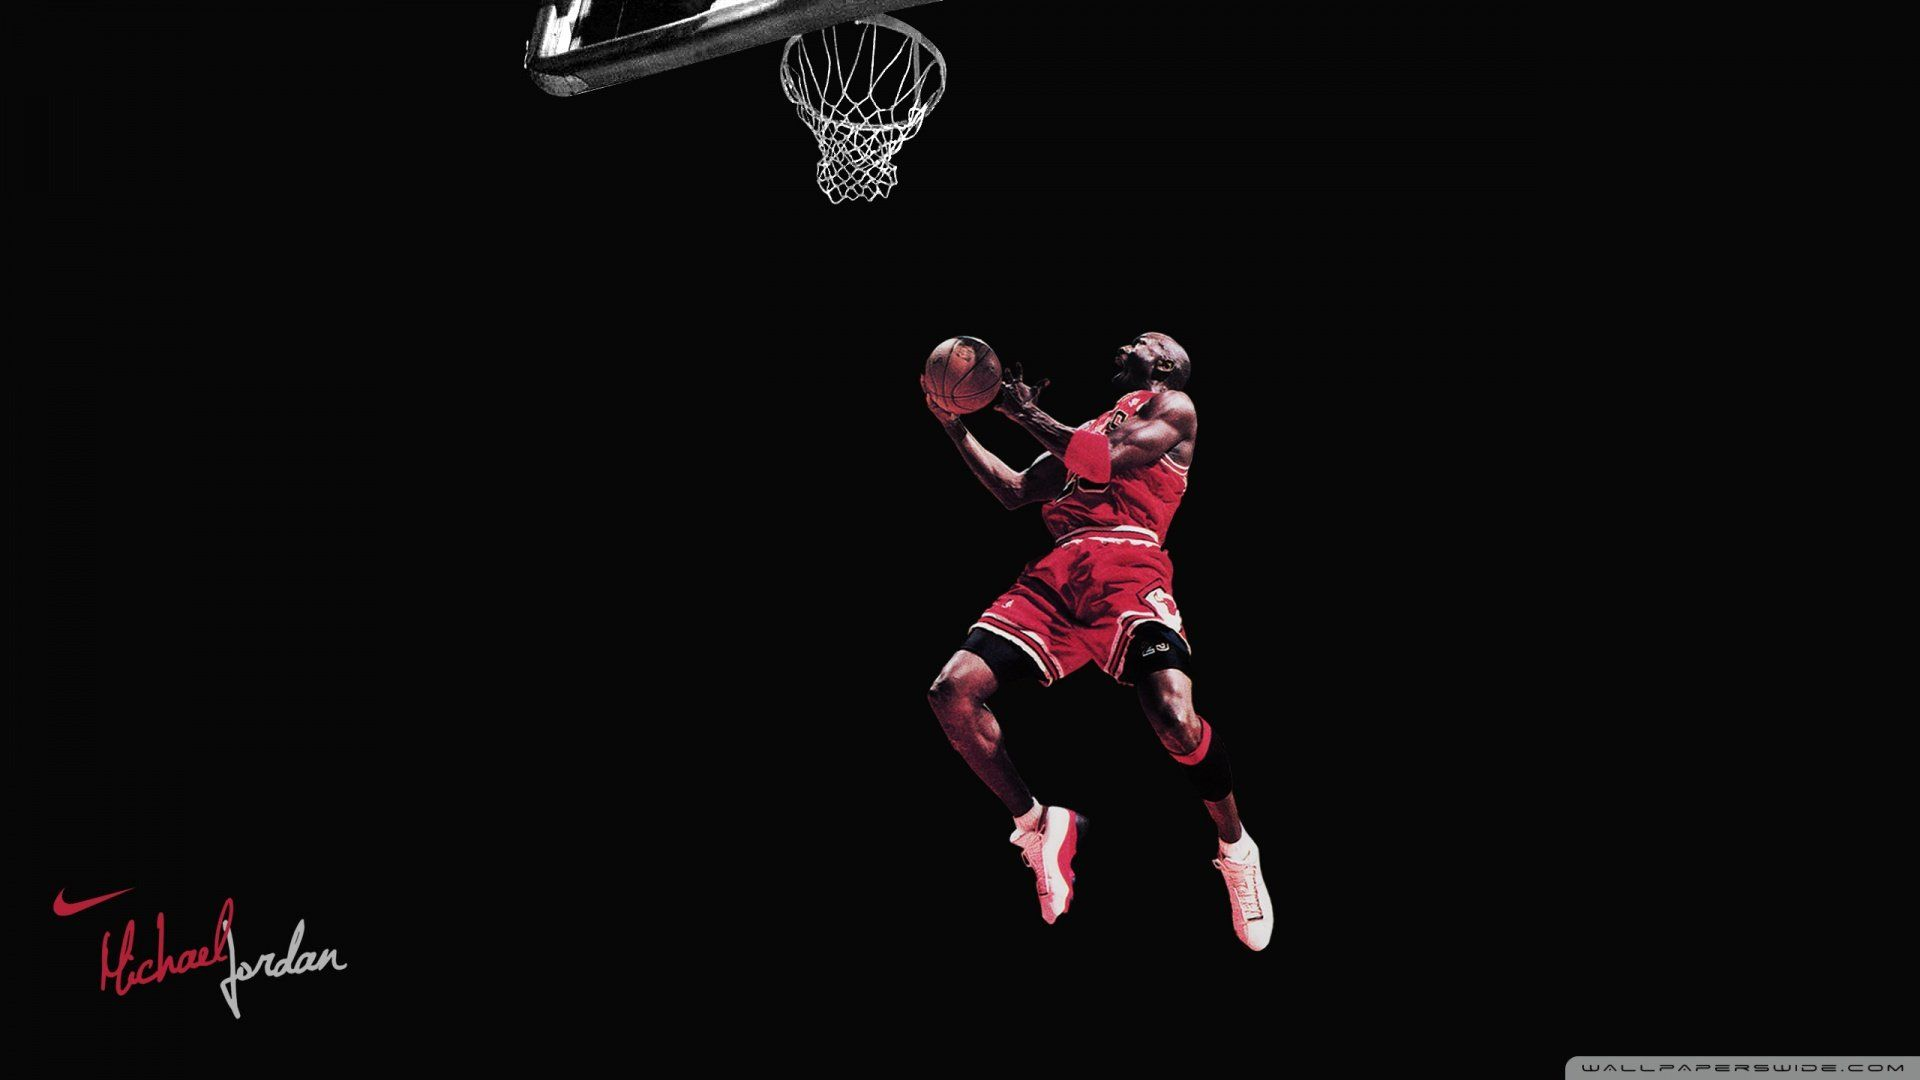 Nowy Jork ładne buty urok kosztów Michael Jordan Wallpapers Wide ~ Desktop Wallpaper Box ...